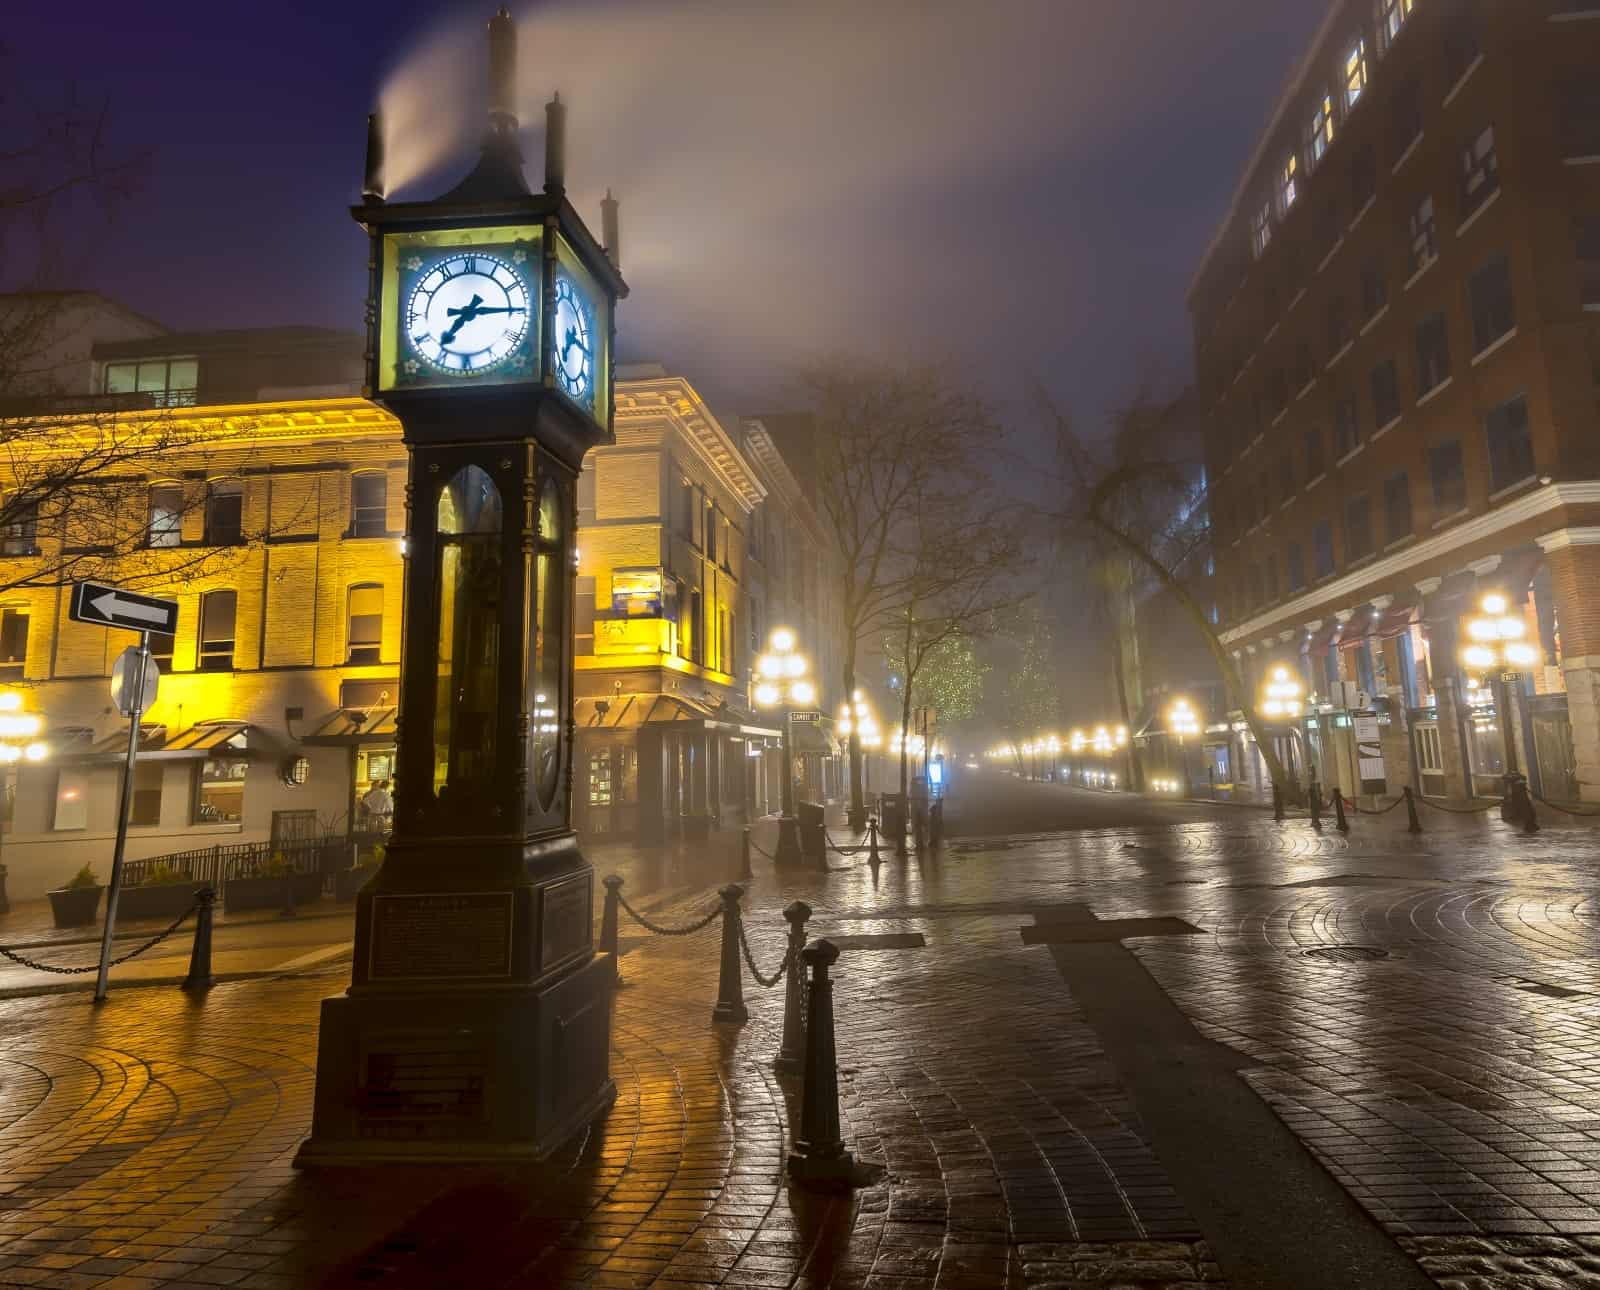 Vancouver Gastown mit der berühmten Steam-Clock Foto JamesWheeler